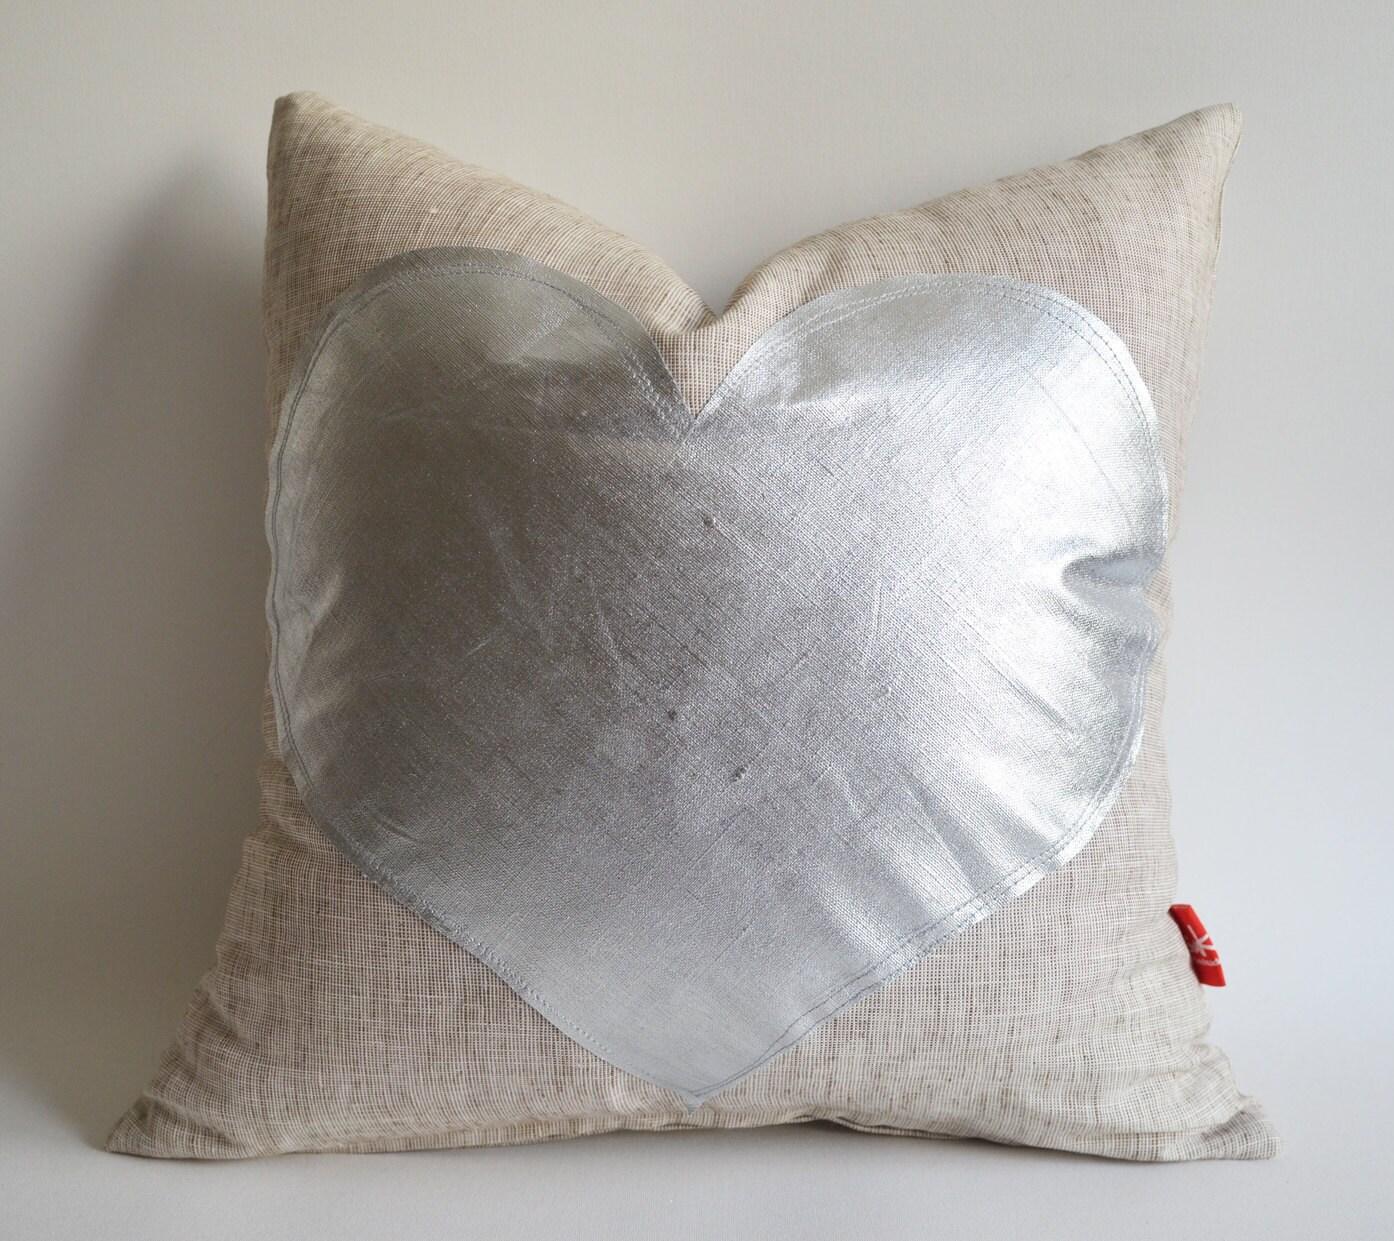 Sukan / Silver Heart Pillow Cover - Raw Linen Pillow - Decorative Pillow - Accent Pillow - Valentine Day Gift - 16x16 Pillow Cover